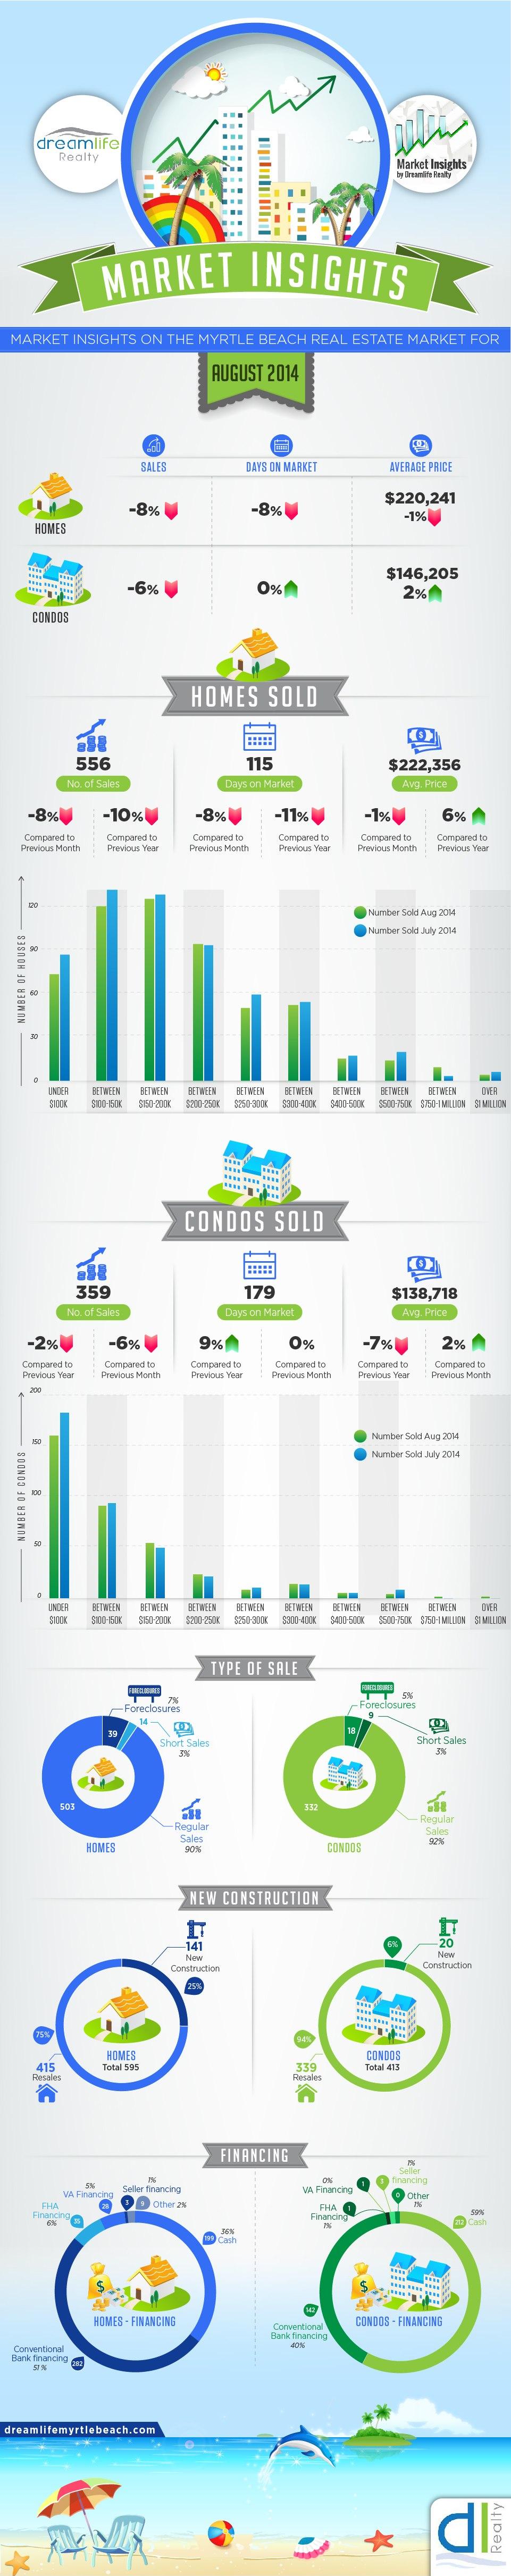 Myrtle Beach Real Estate Market Update Infographic - August 2014